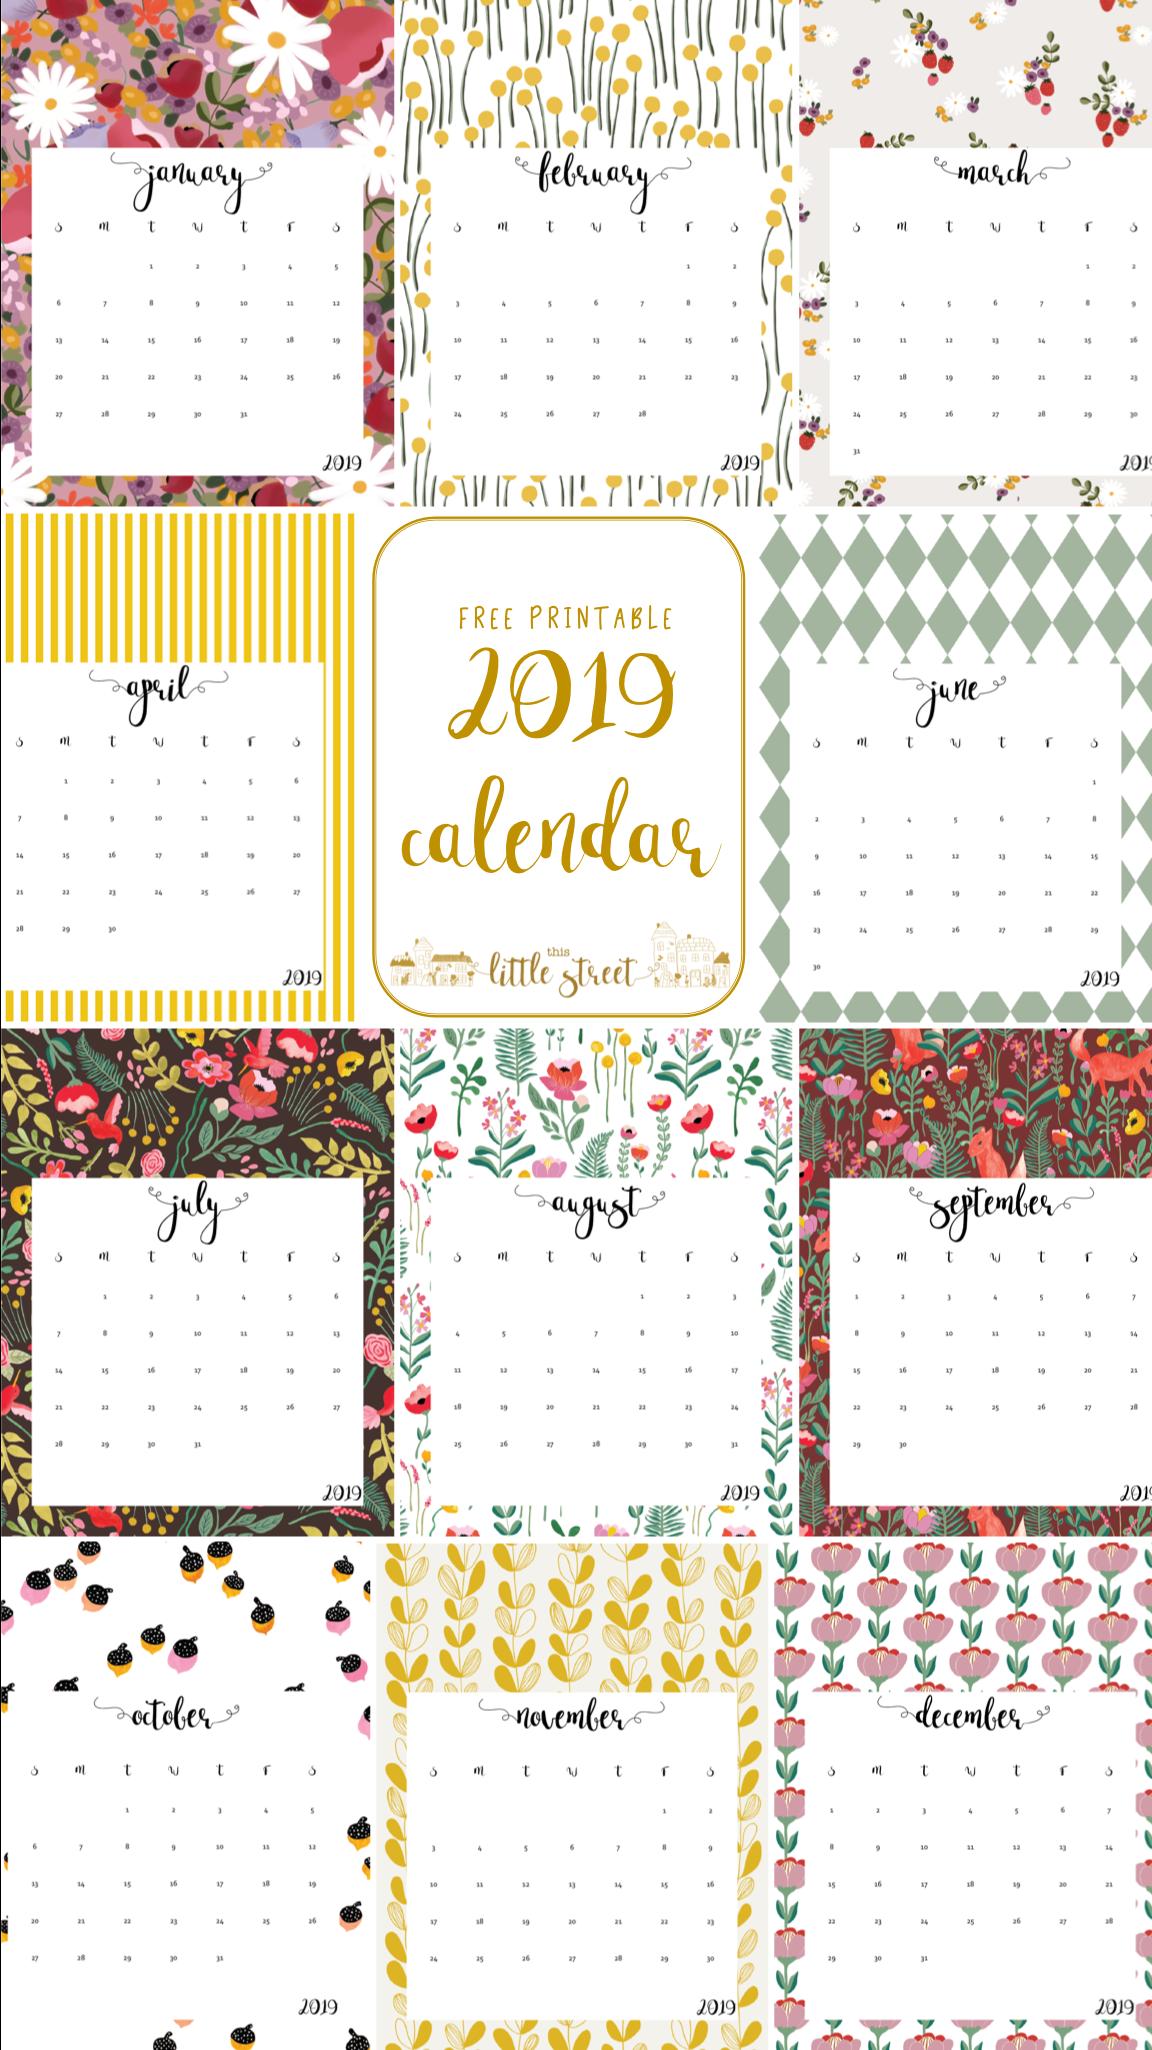 2019 Calendar Free Printable Free Printable Calendar Calendar